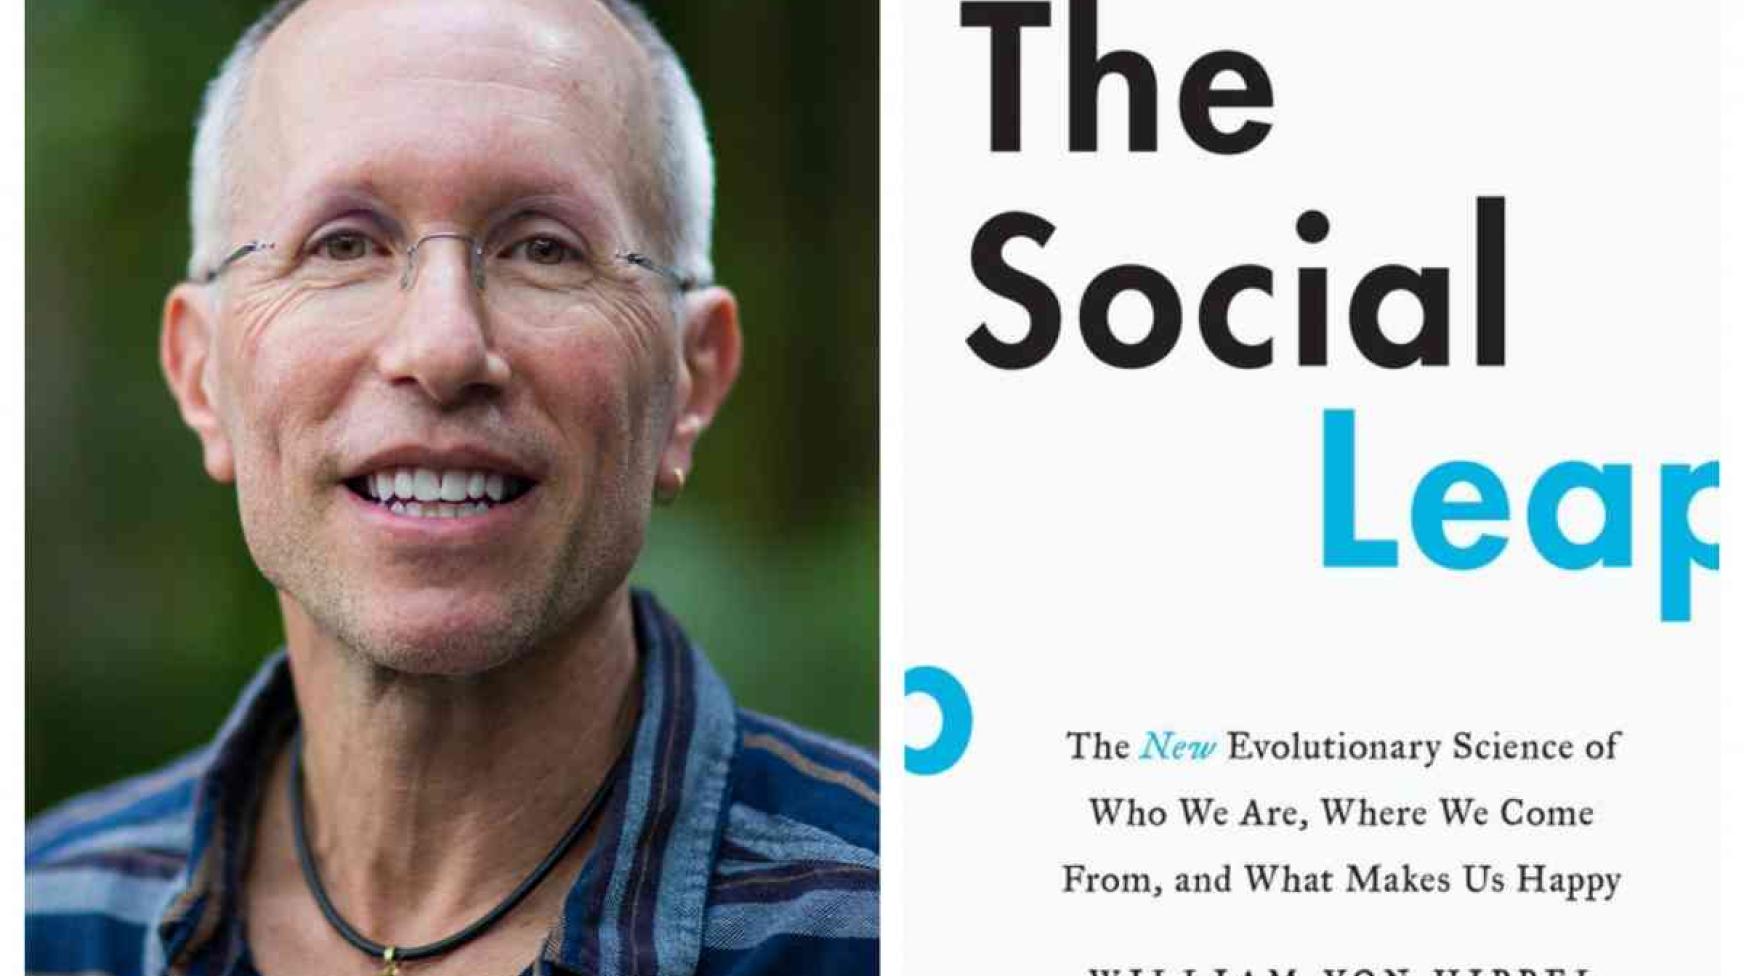 Bill von Hippel invite to Toucan Social